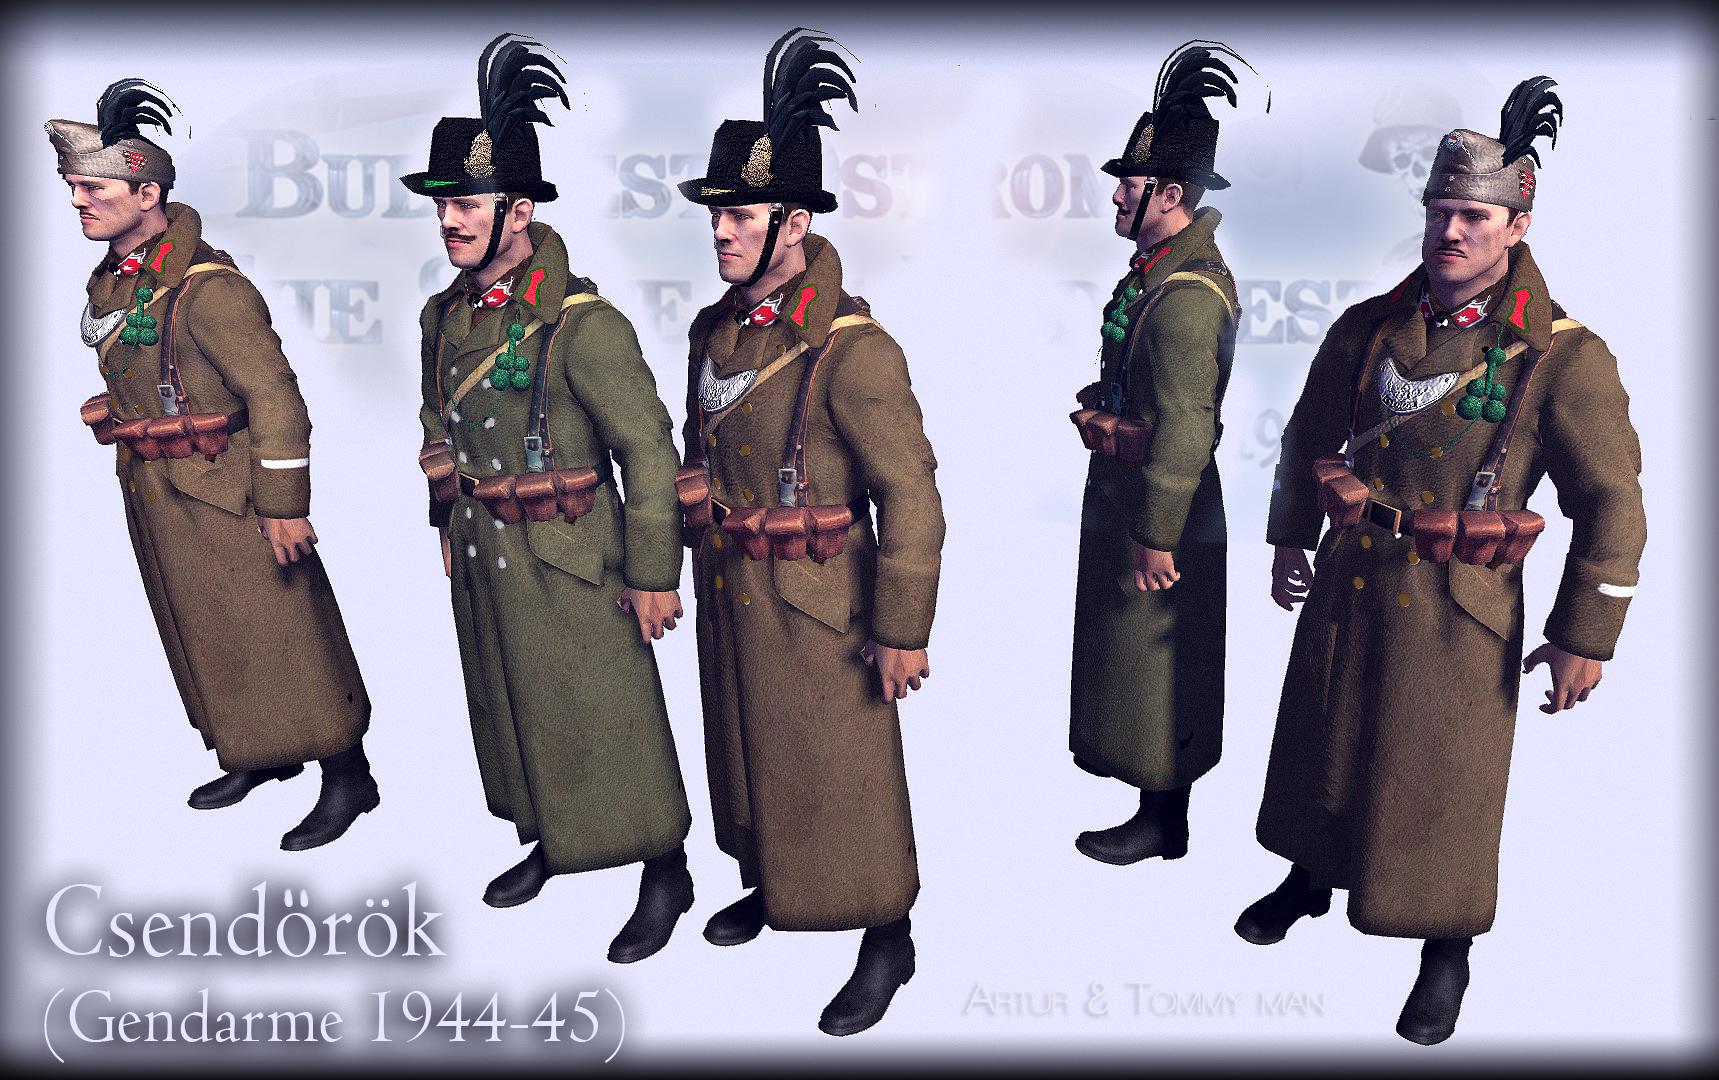 Csendőr kBudapest 1945 ostroma,game jatek,